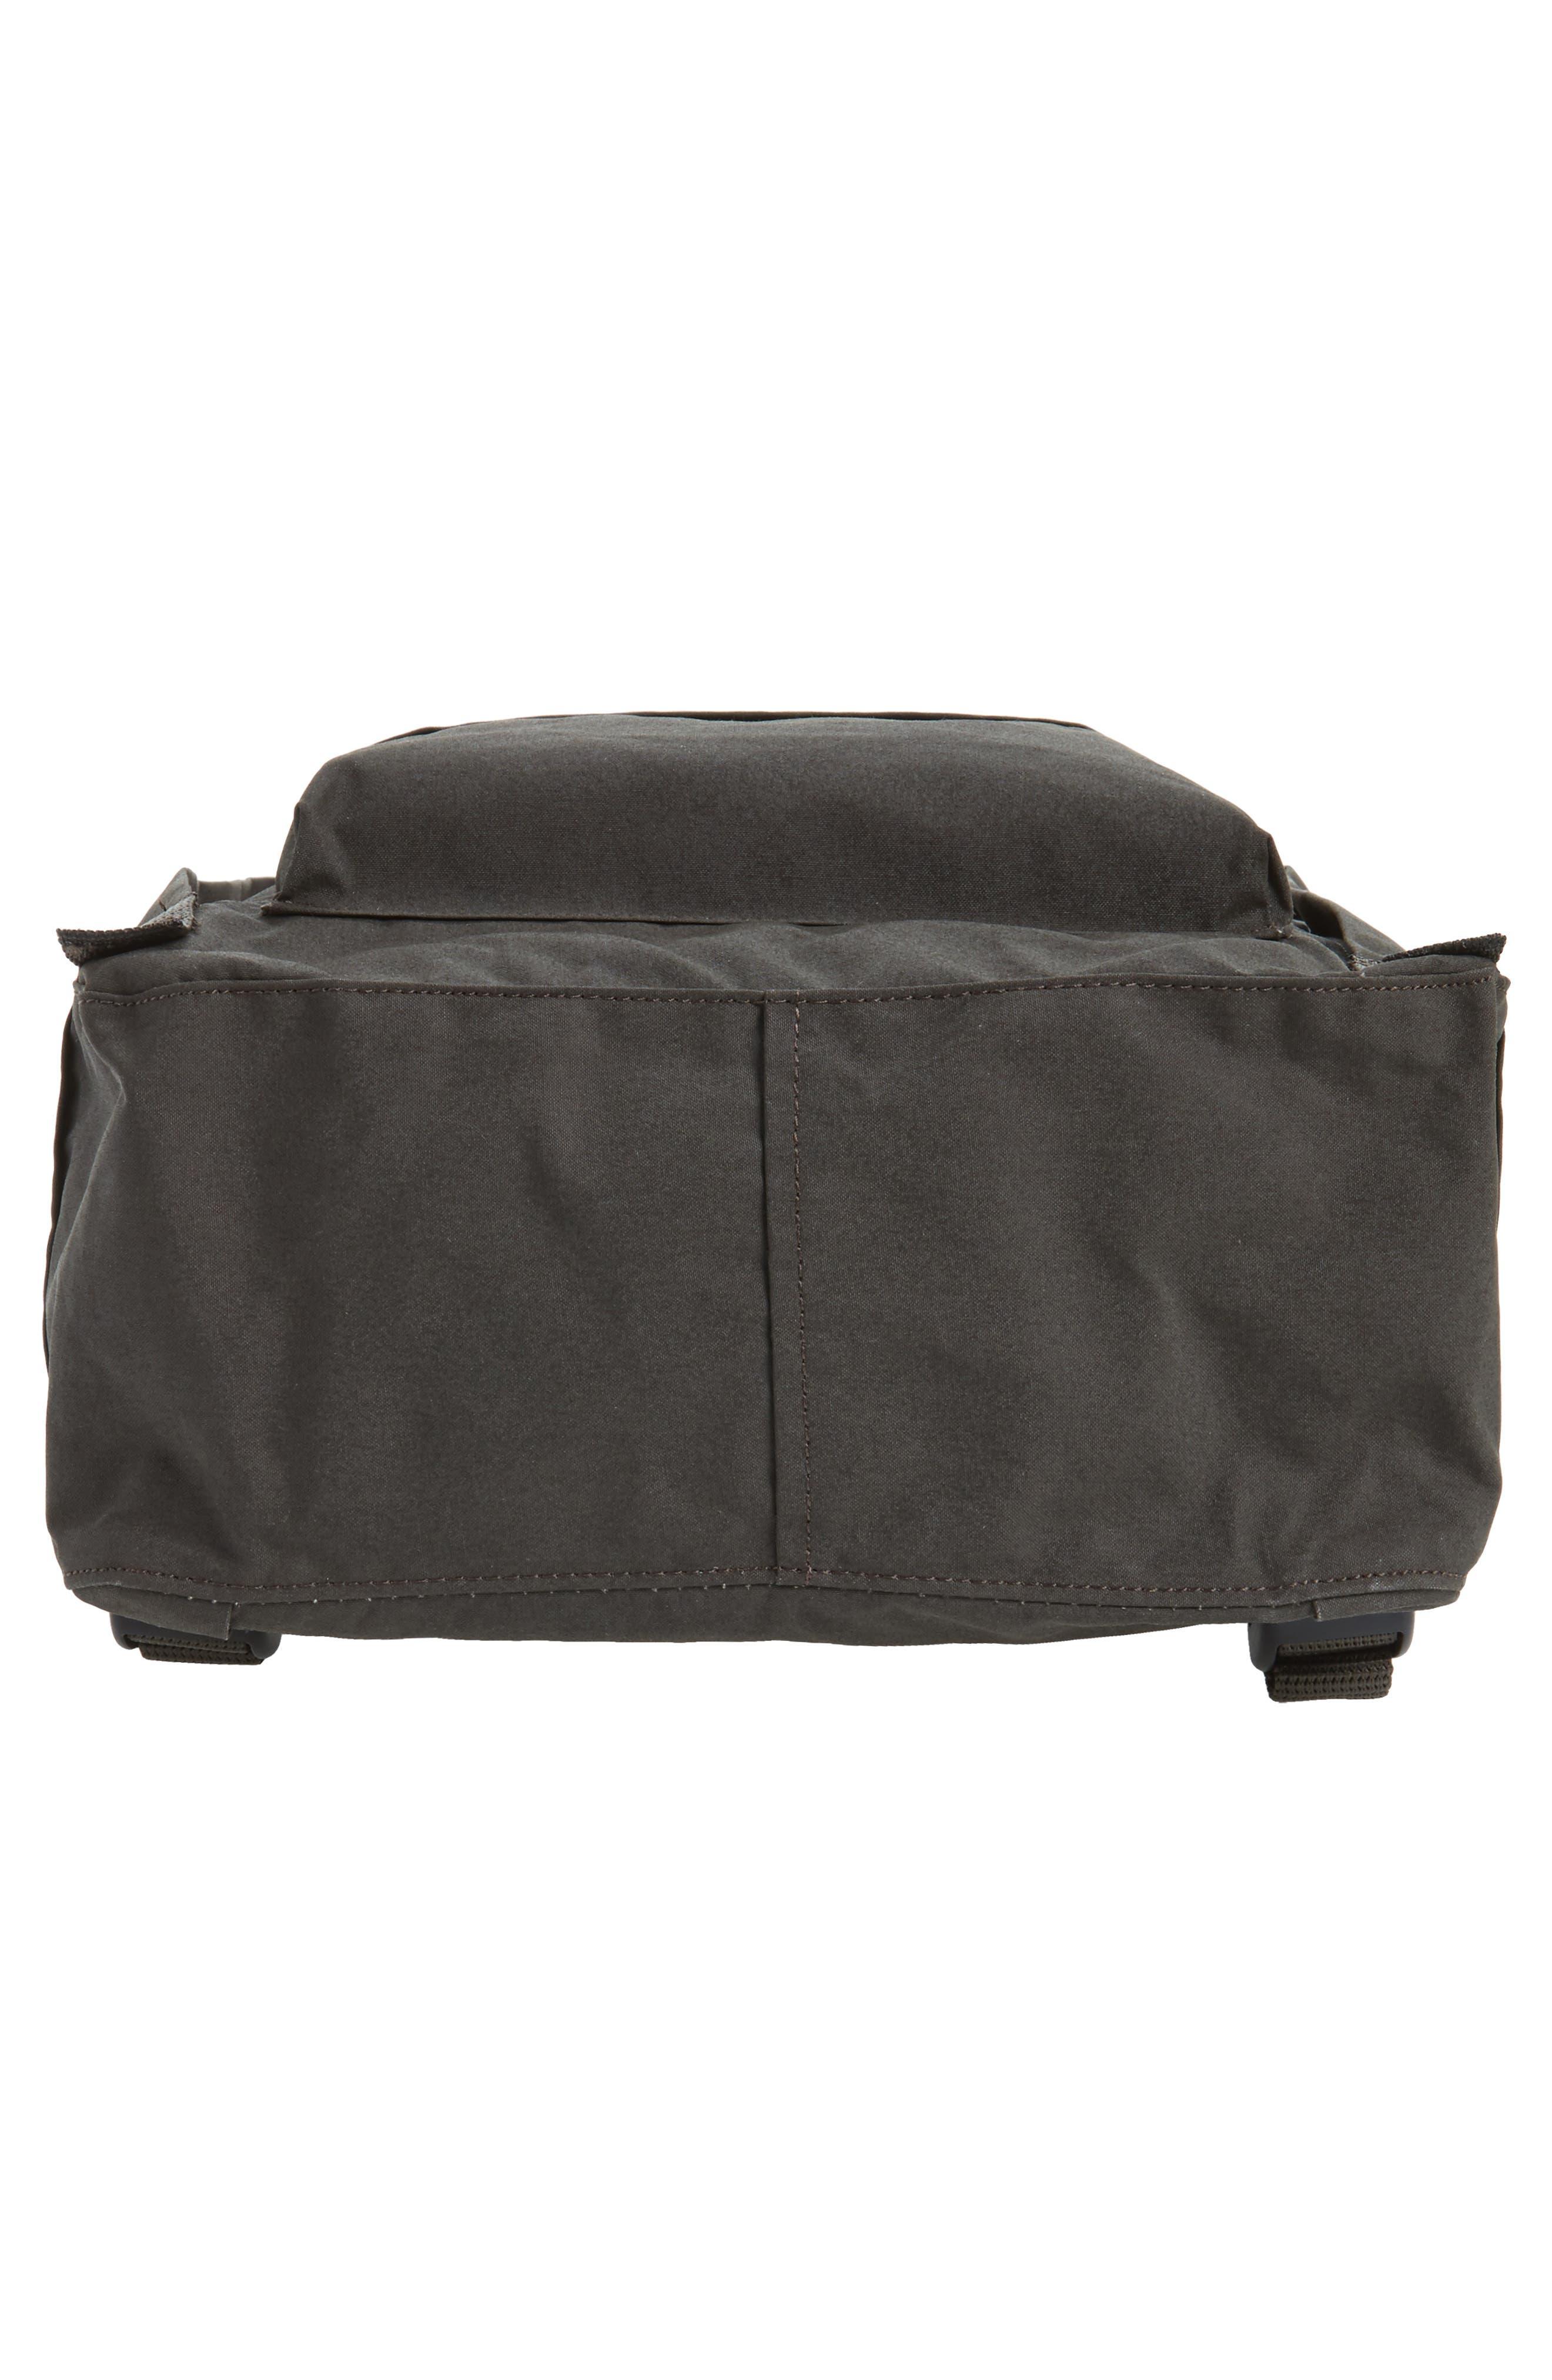 'Kånken' Water Resistant Backpack,                             Alternate thumbnail 324, color,